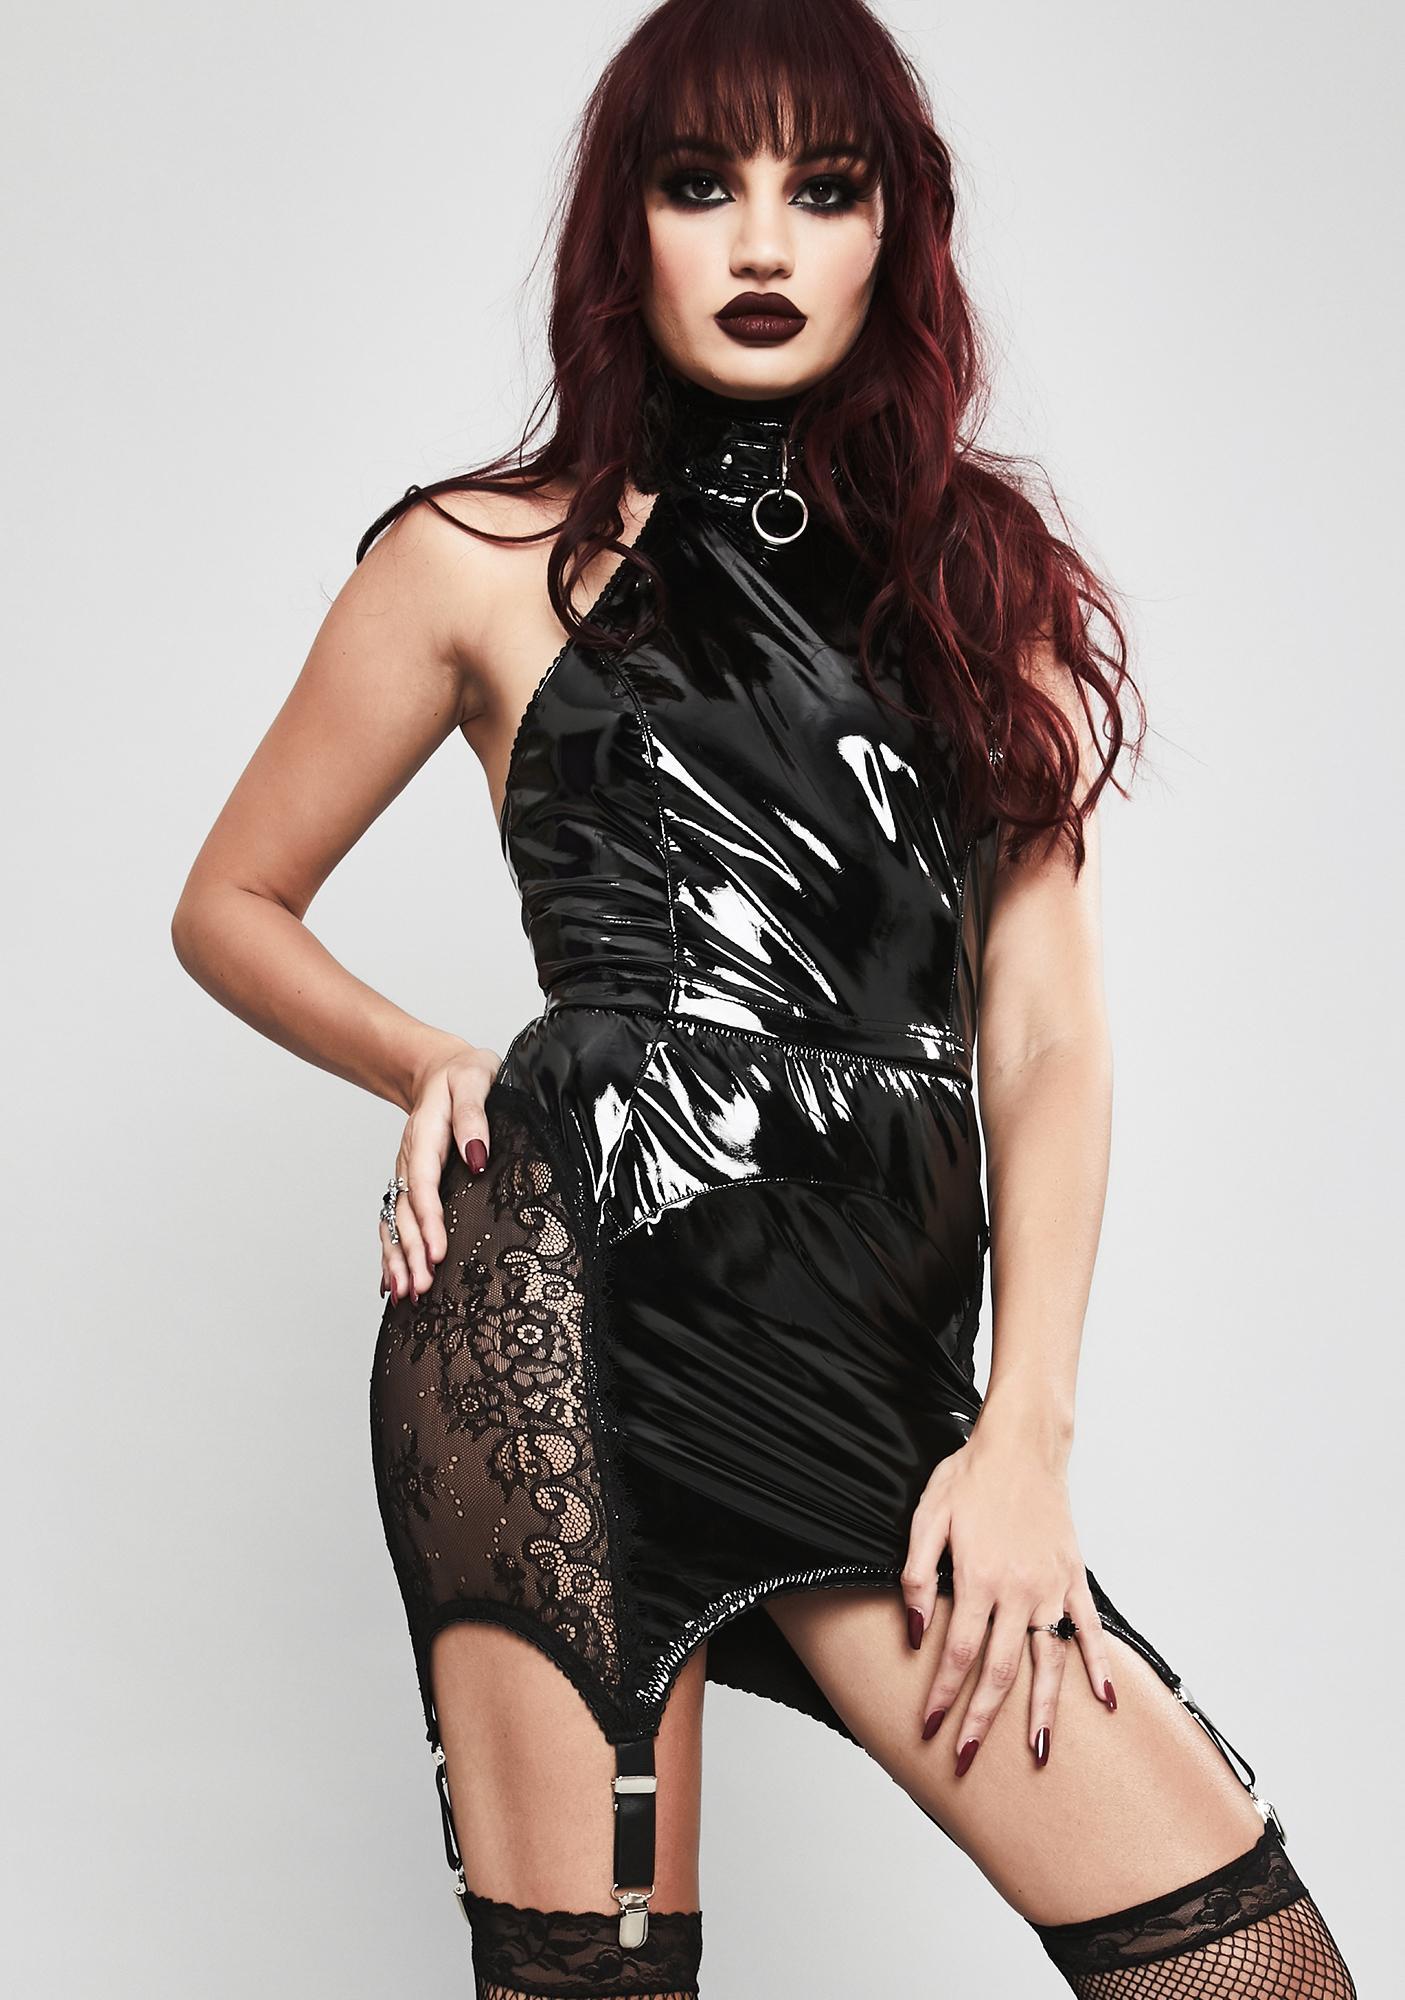 Widow Twisted Desire Vinyl Skirt